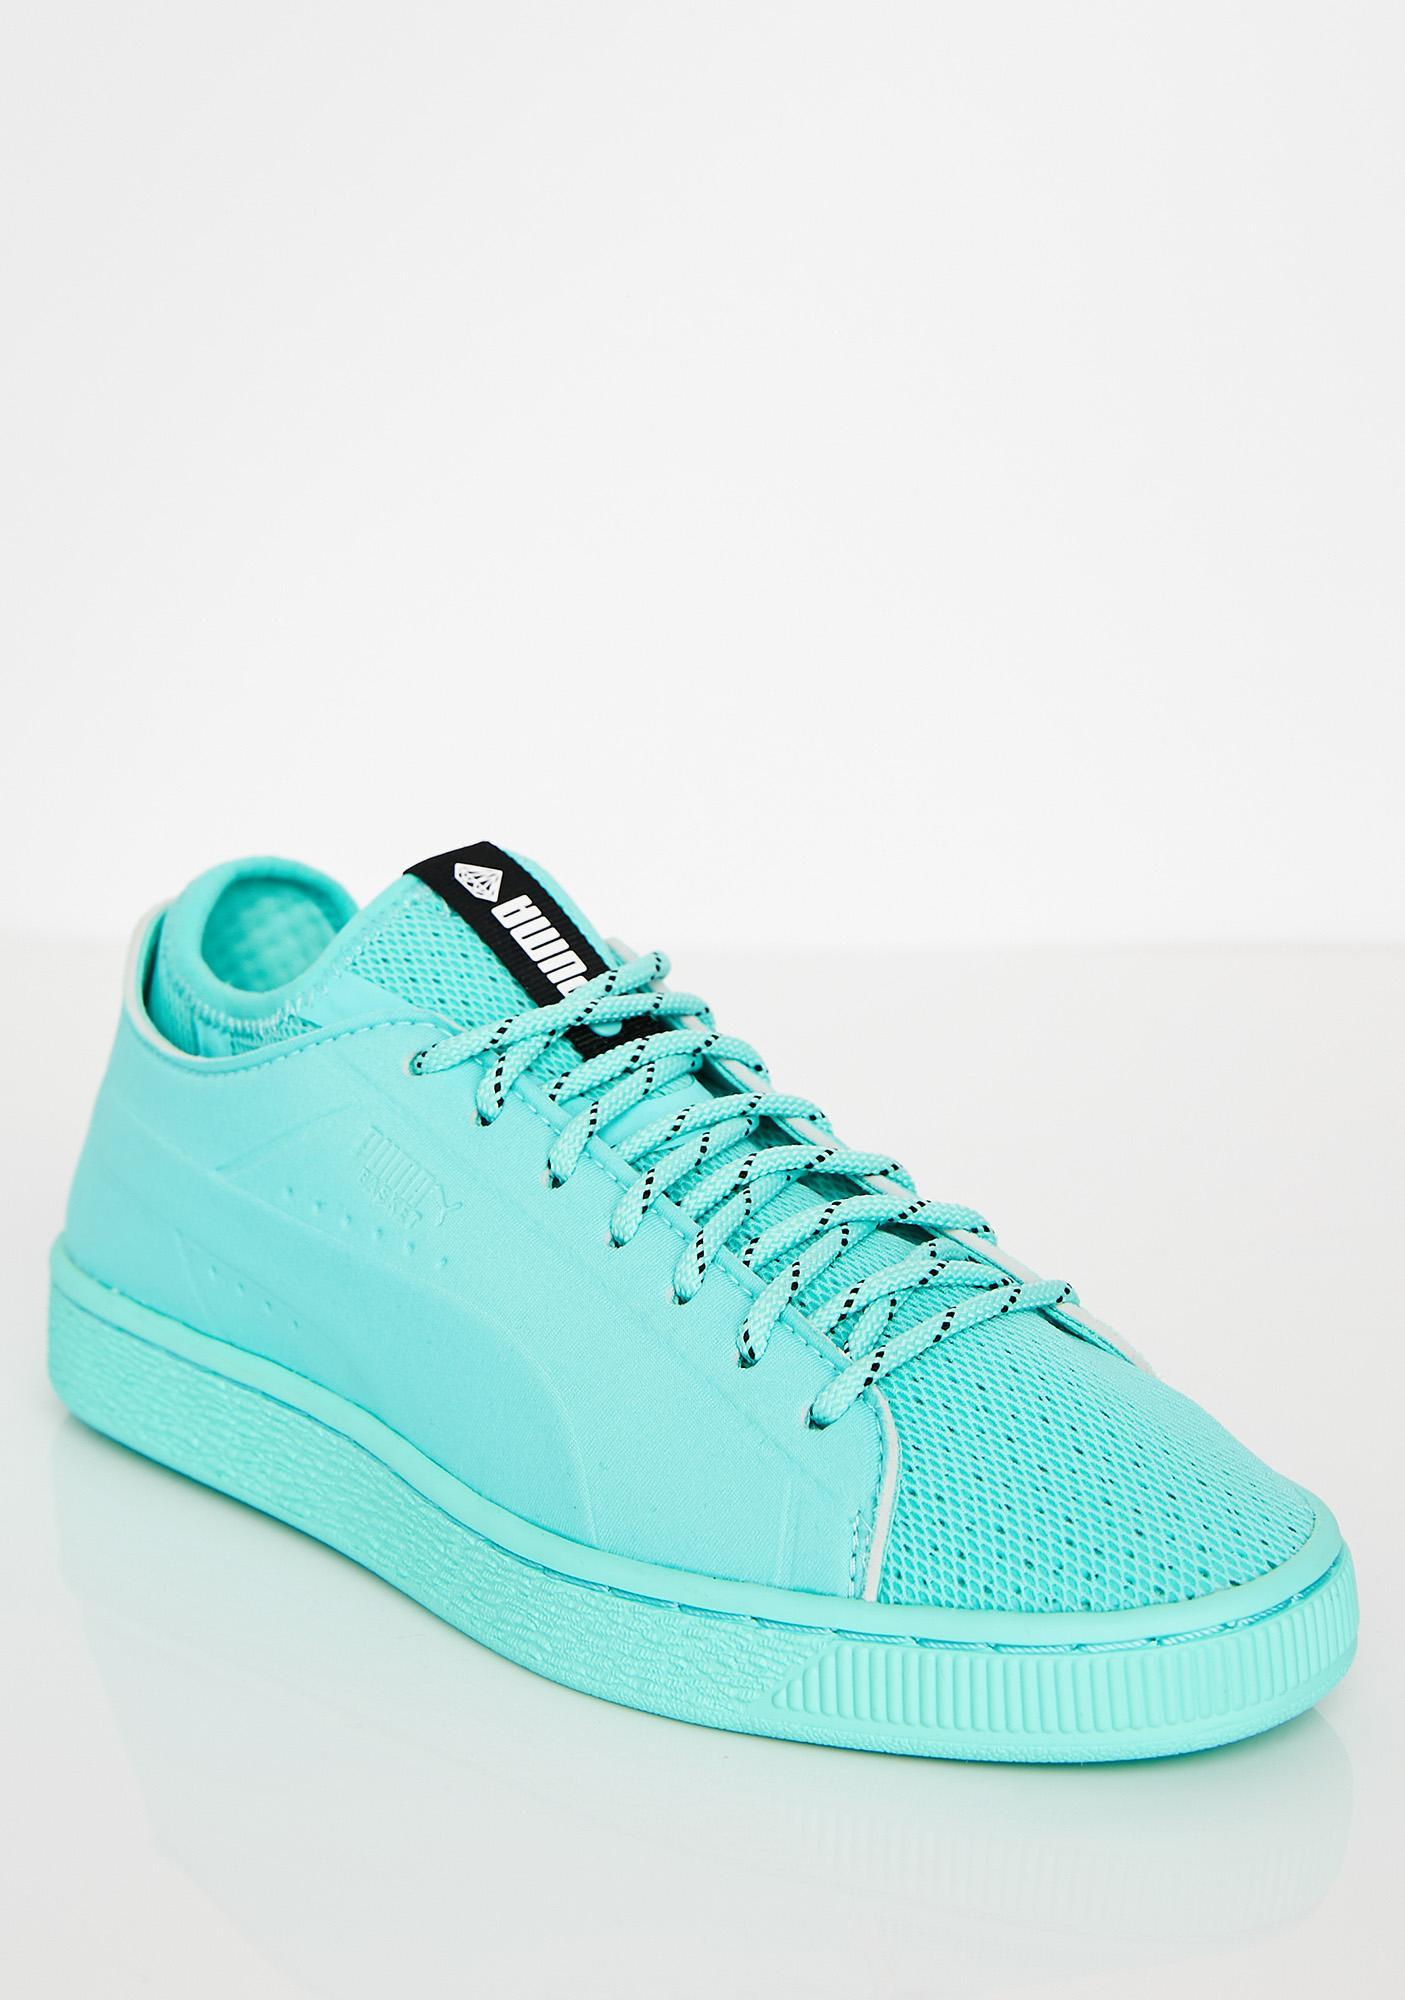 PUMA x Diamond Basket Sock Lo Sneakers